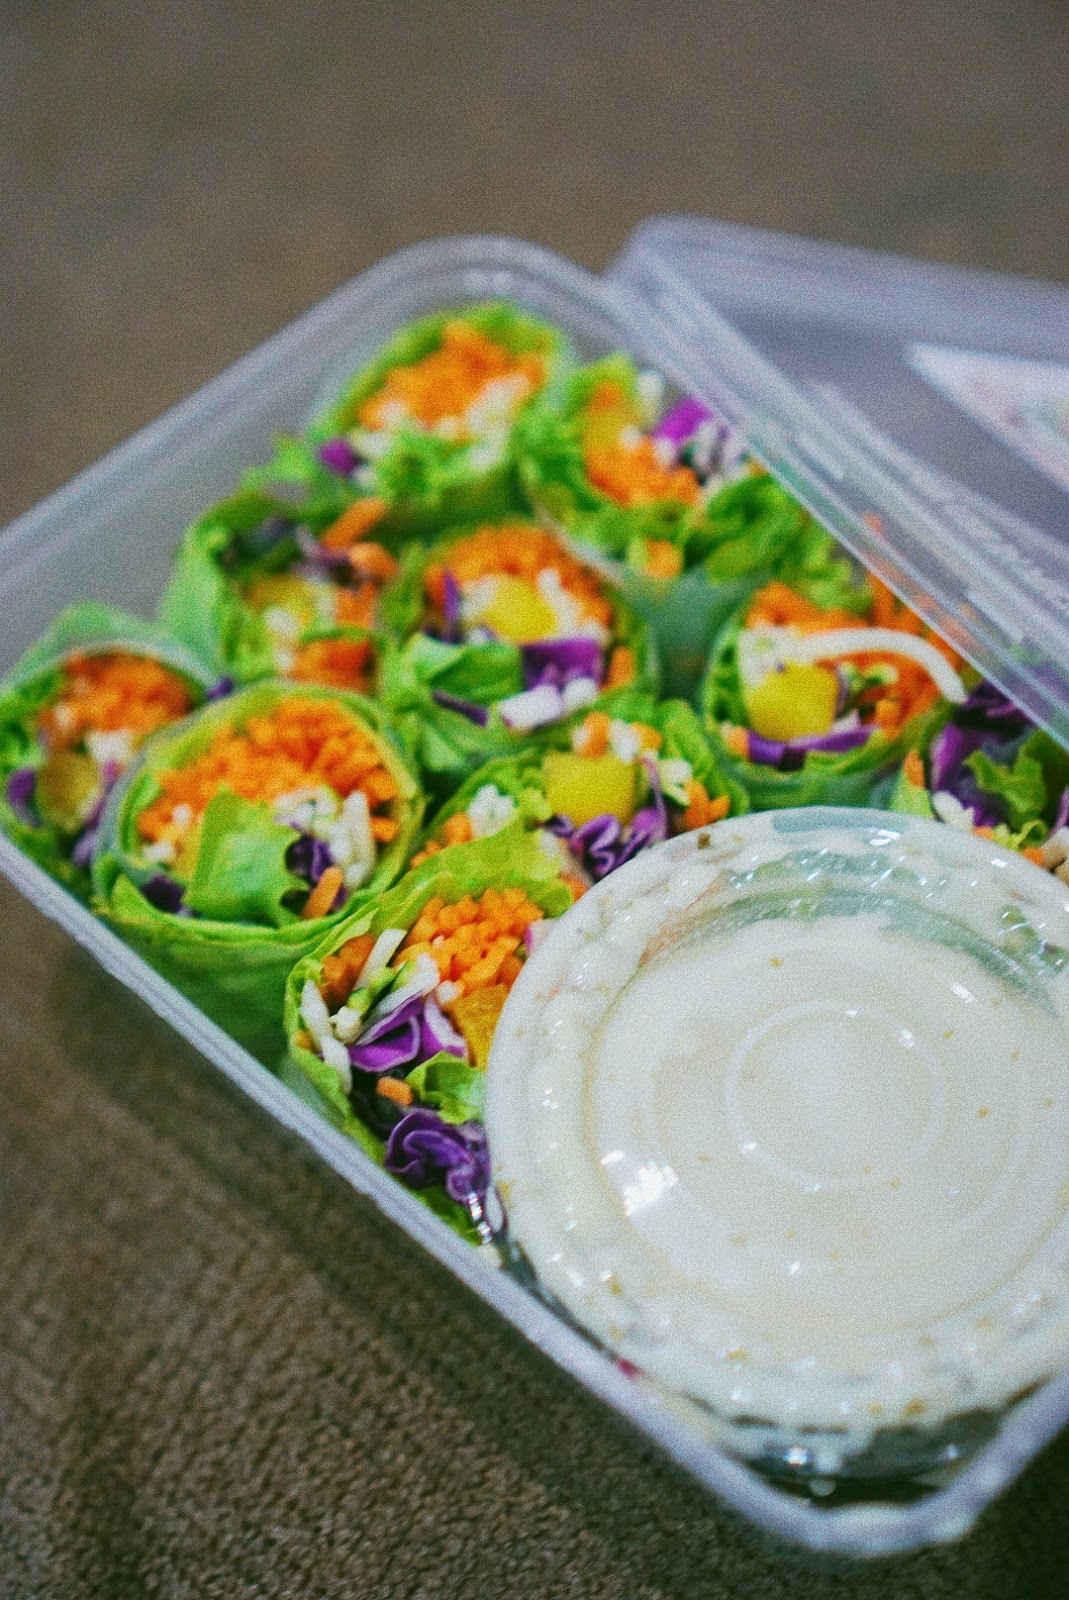 Serasa Salad Bar = Sekotak Pelangi Bernutrisi - Salad Roll 2